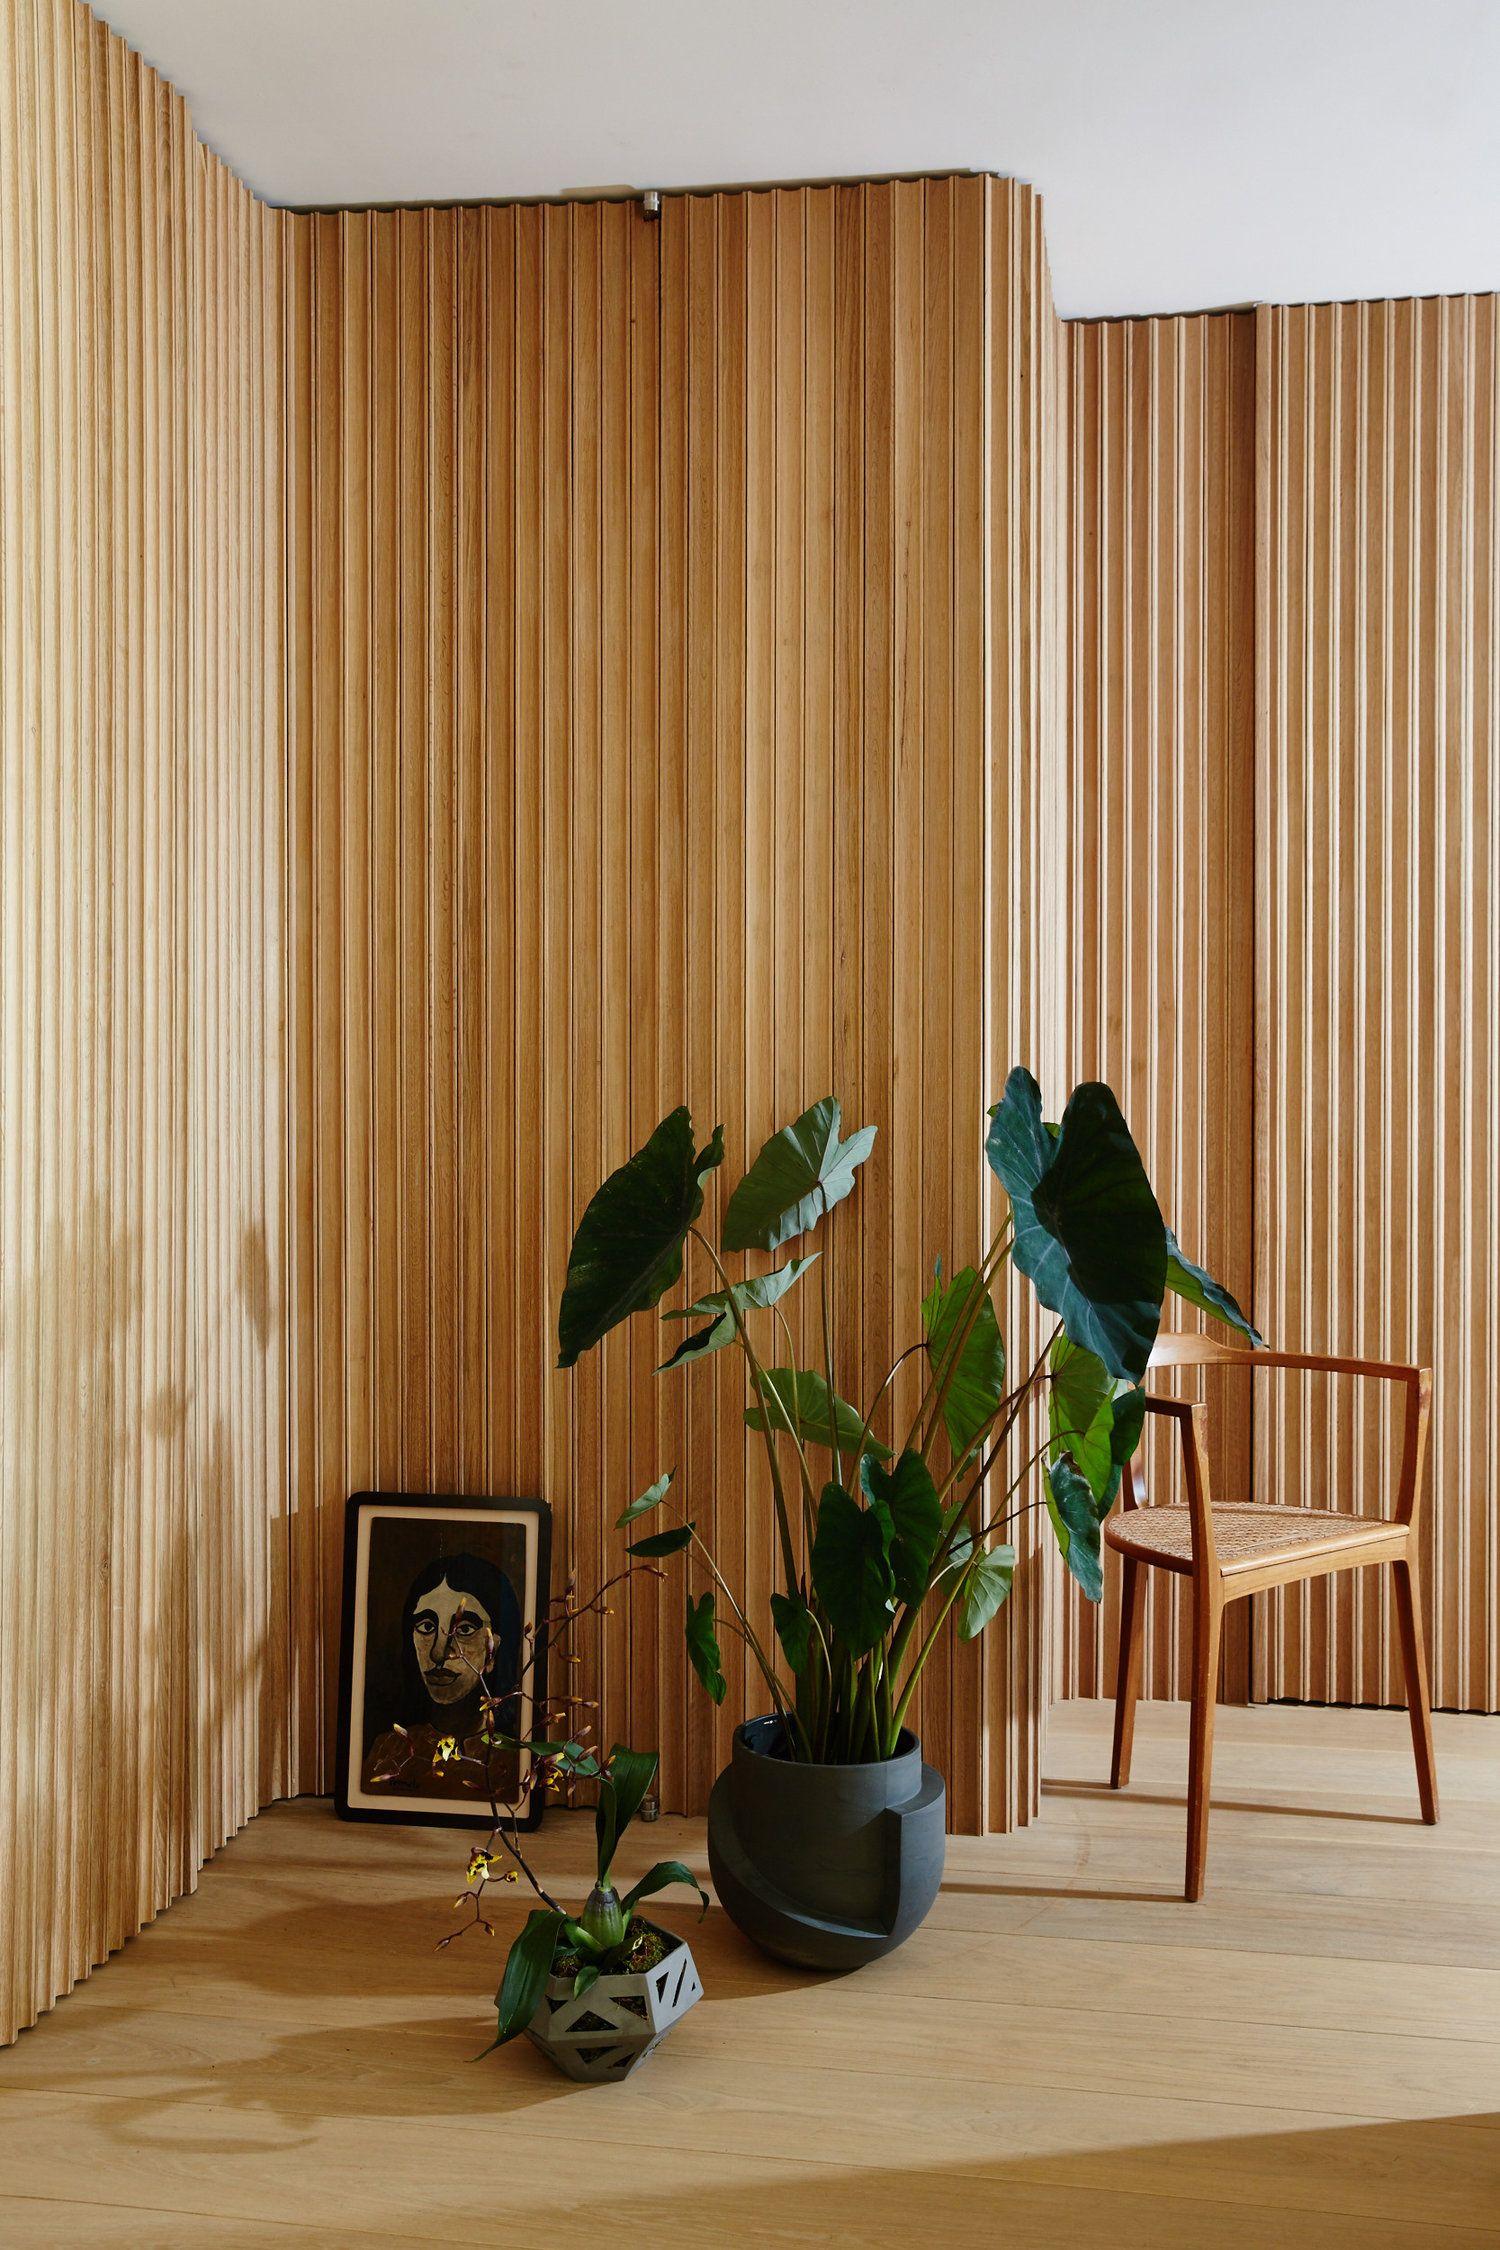 Nicole frazen photos interior pinterest panelling warm and